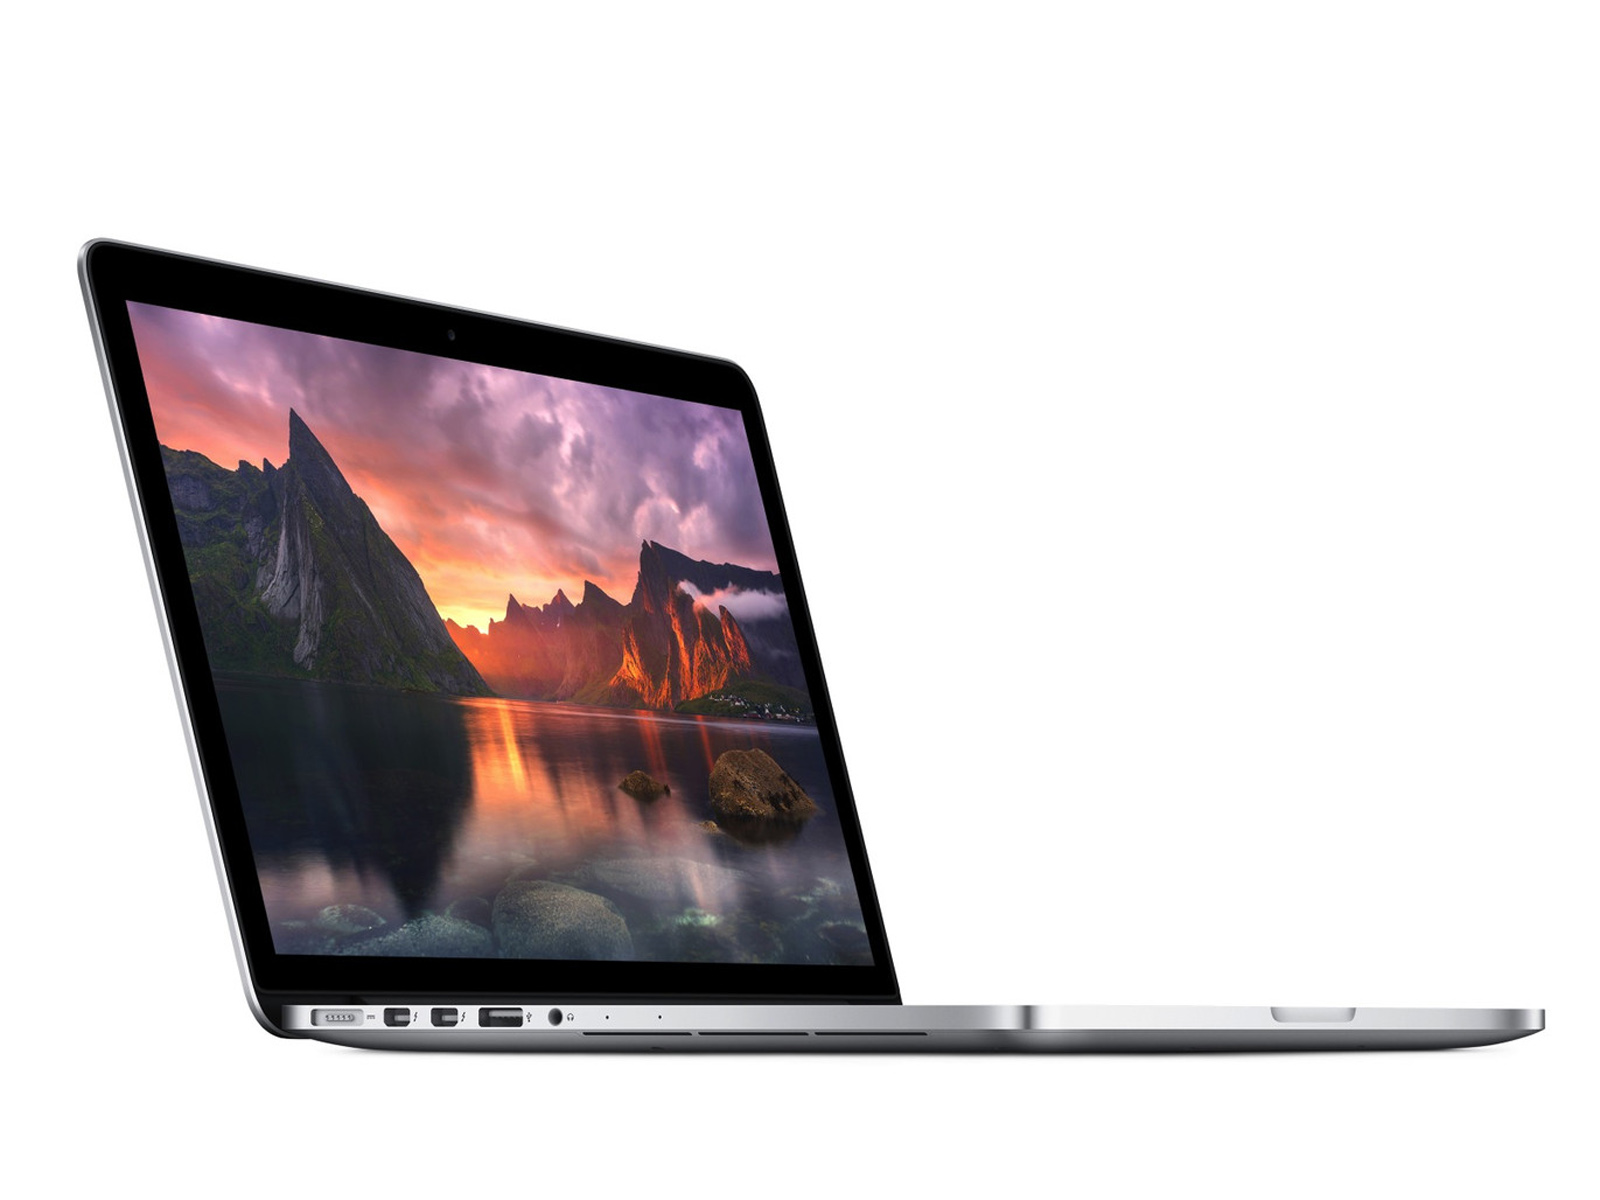 Verify macbook pro